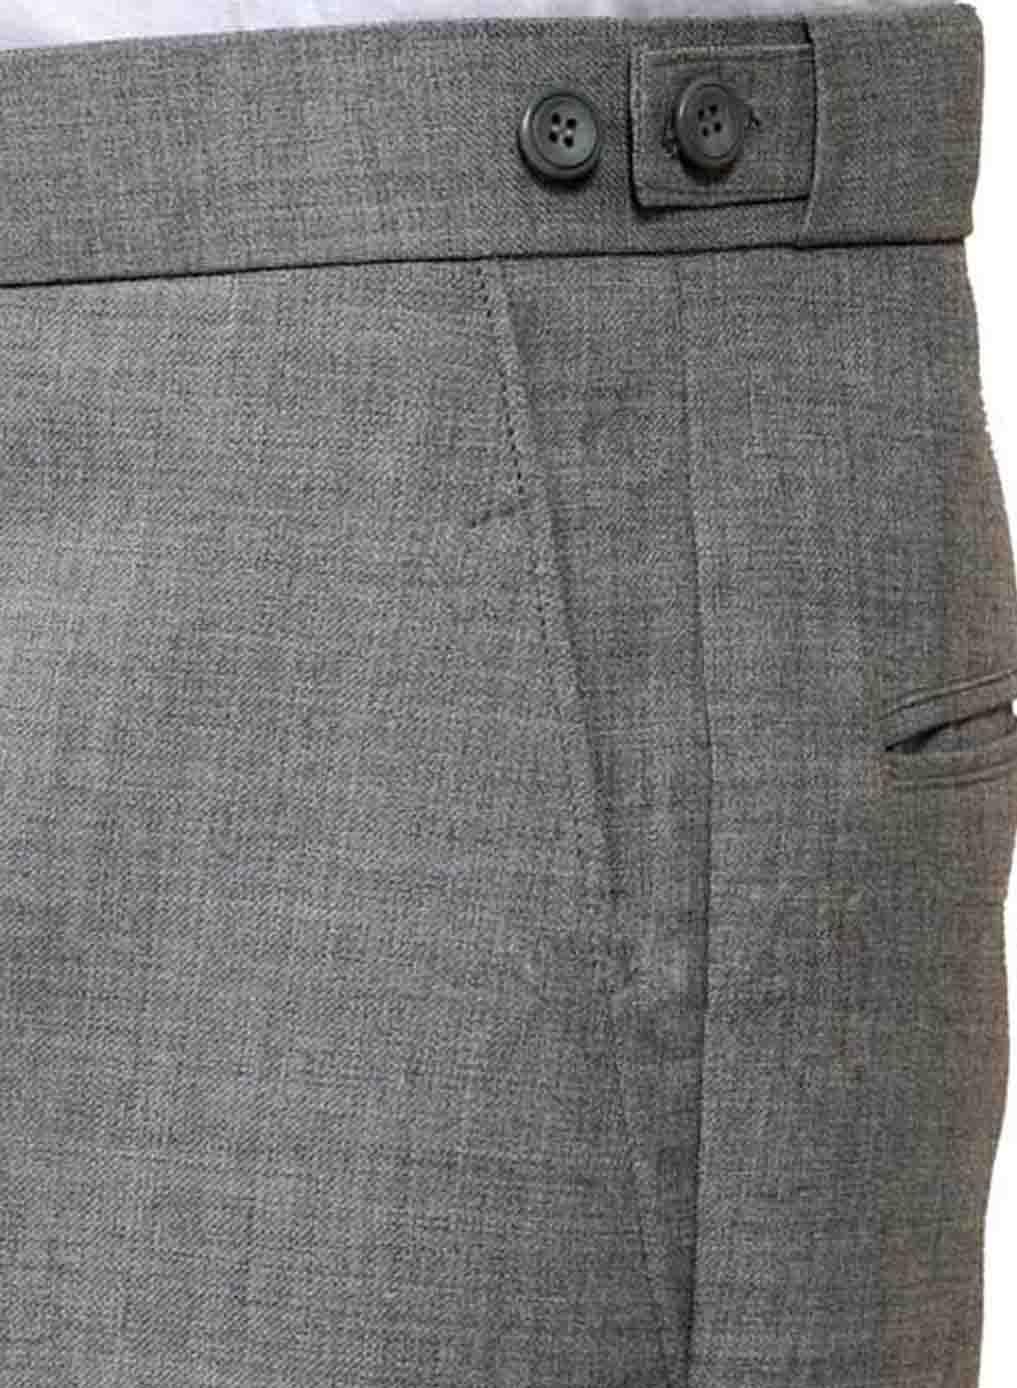 Transporter Daniel Craig Suit